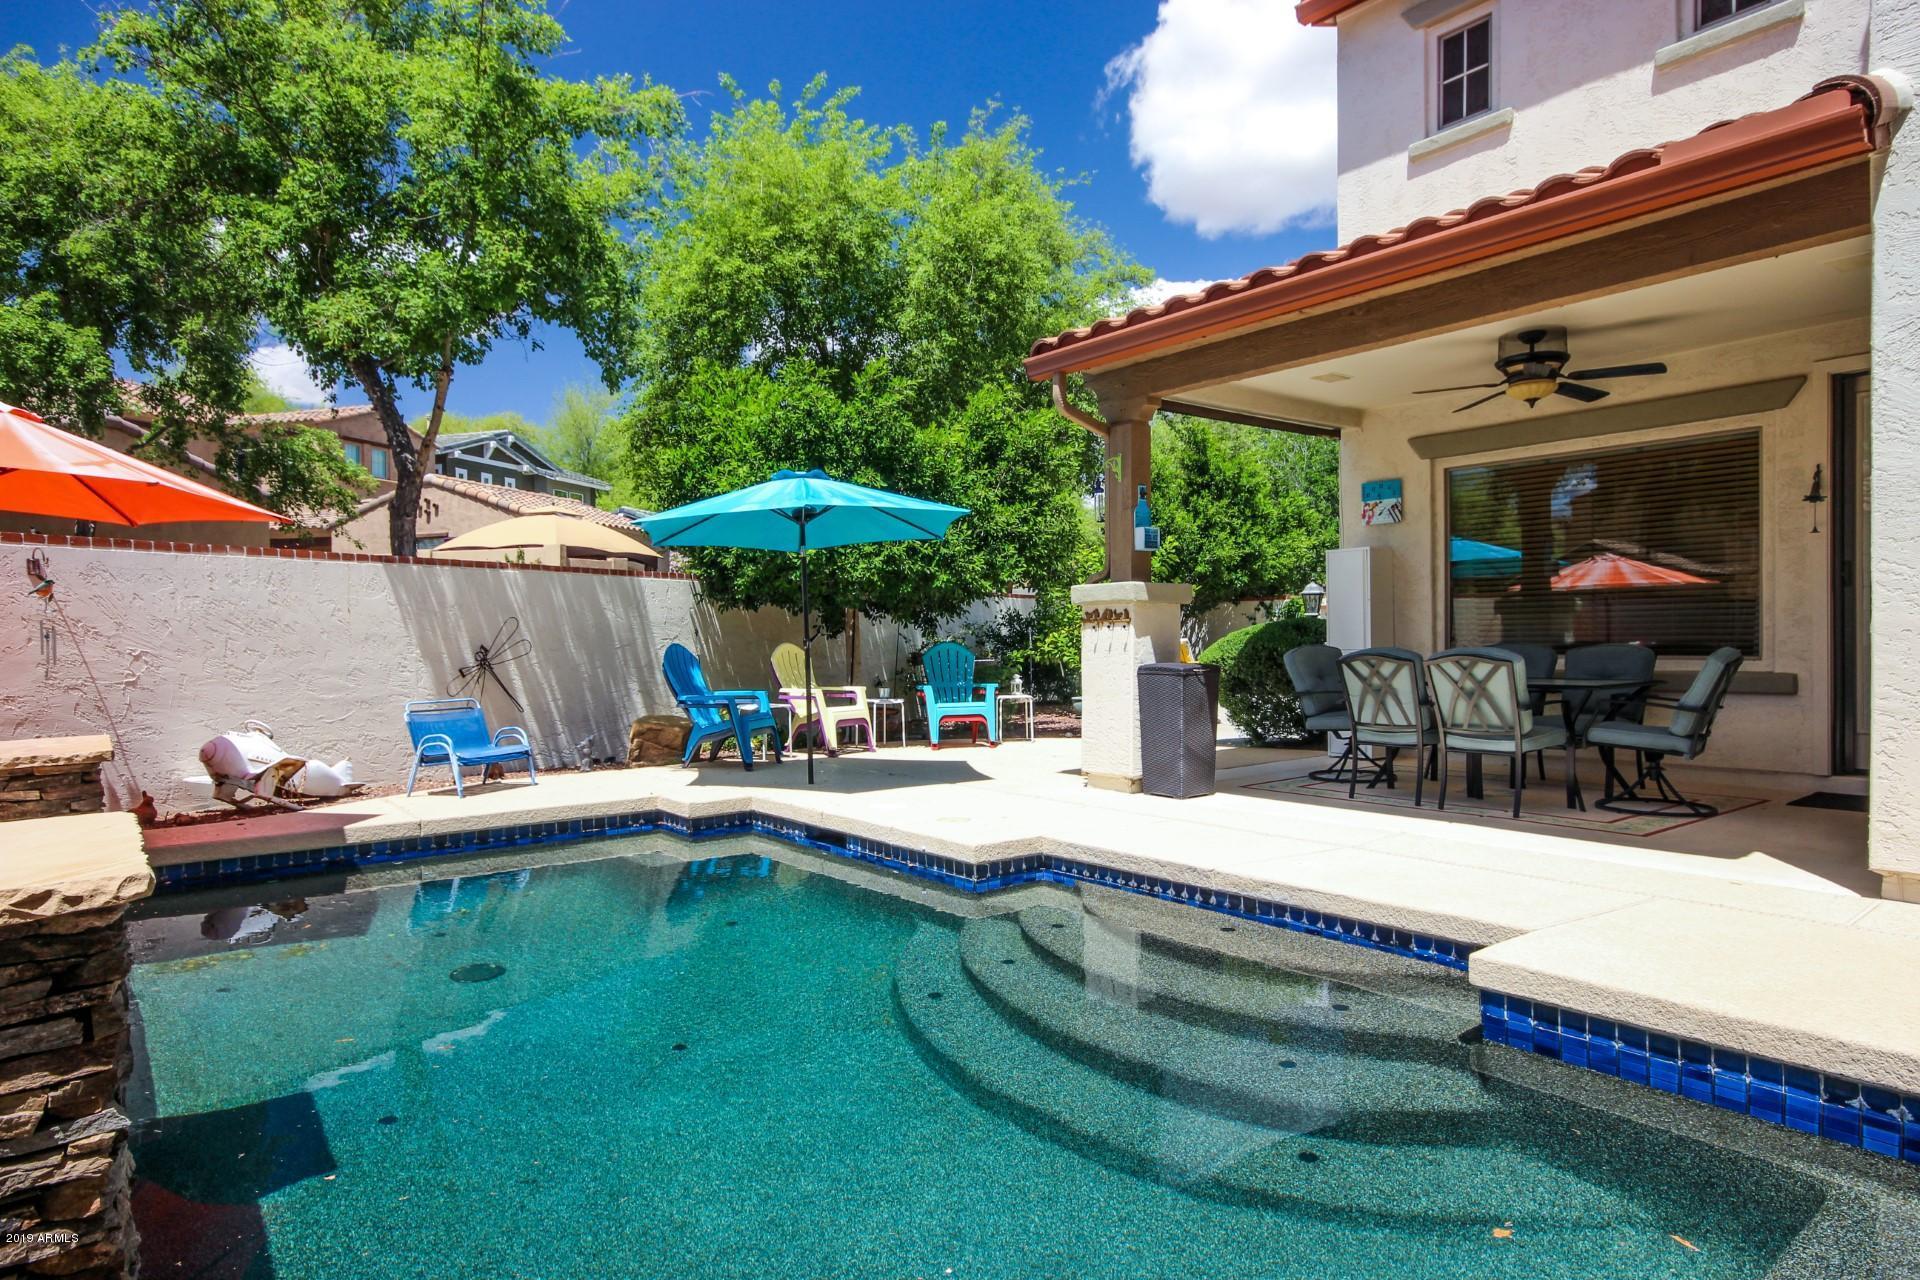 MLS 5920526 20967 W EDITH Way, Buckeye, AZ 85396 Buckeye AZ Private Pool